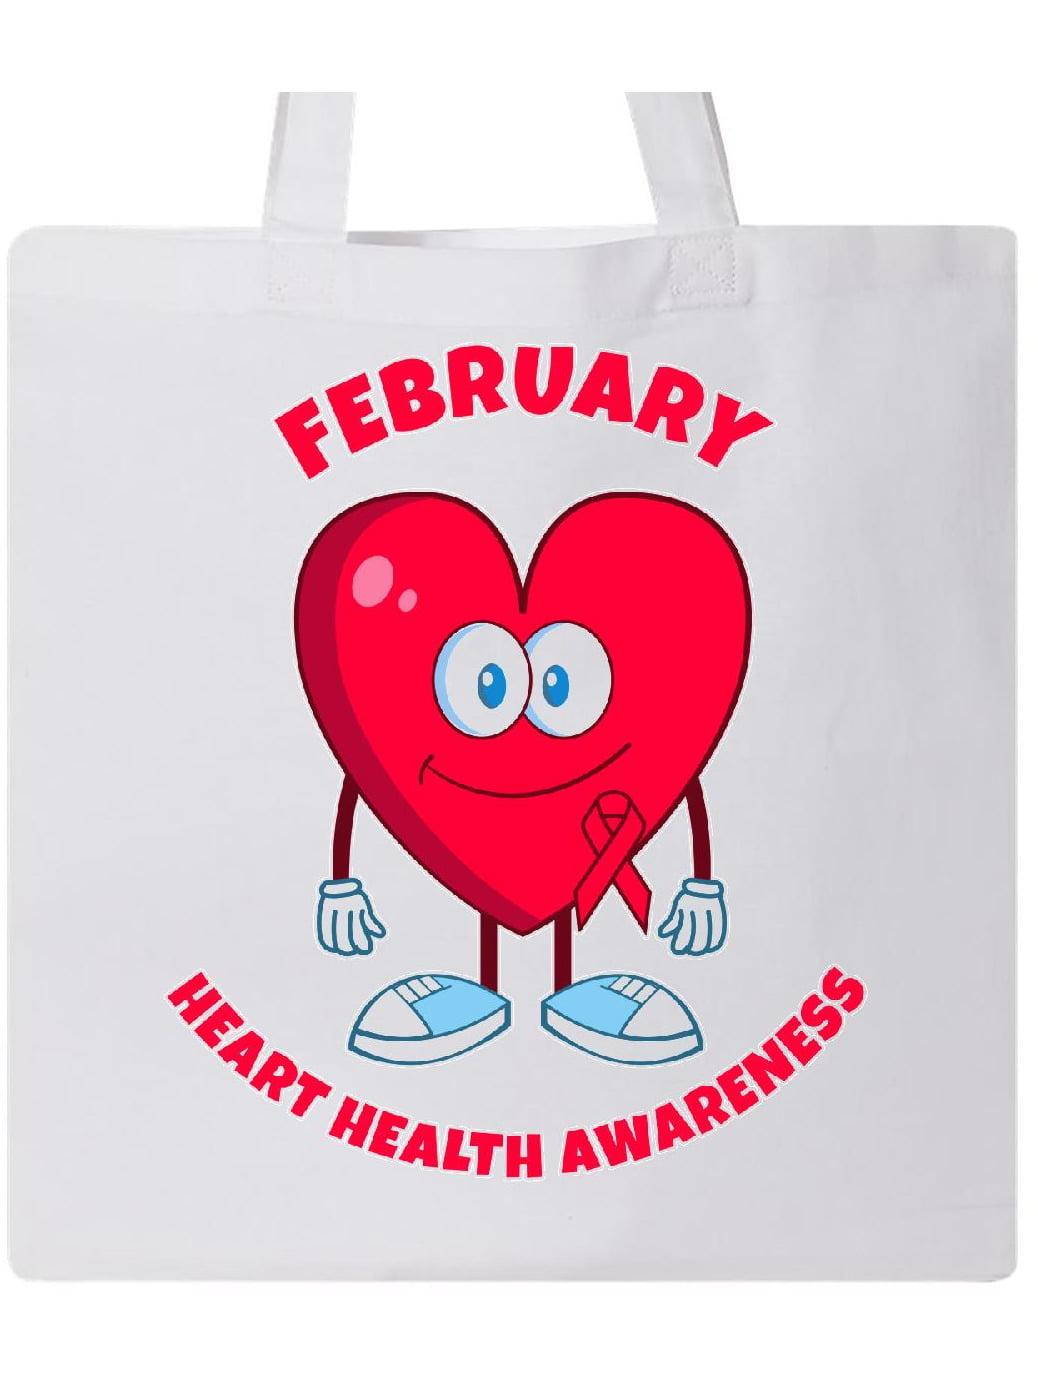 American Heart Month 2019 | Heart Health Awareness ... |February Health Awareness